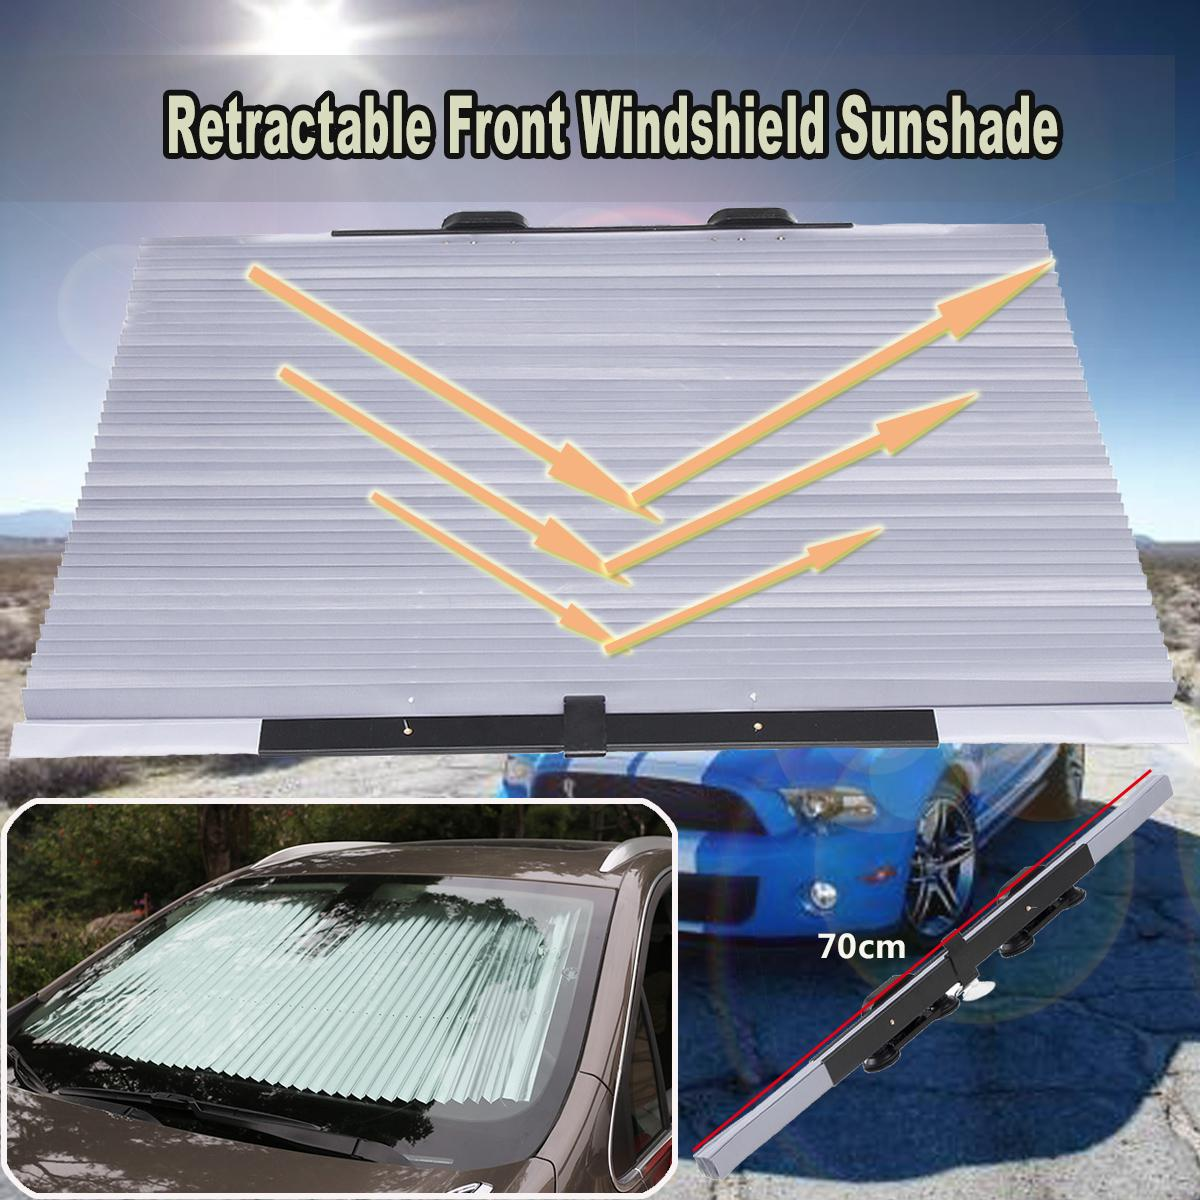 70cm Retractable Car Front Windshield Sun Shade Block Sunshade Cover Sun  Visor Window Foil Curtain Folding External Parts Of Car External Parts Of  The Car ... 801c4586812